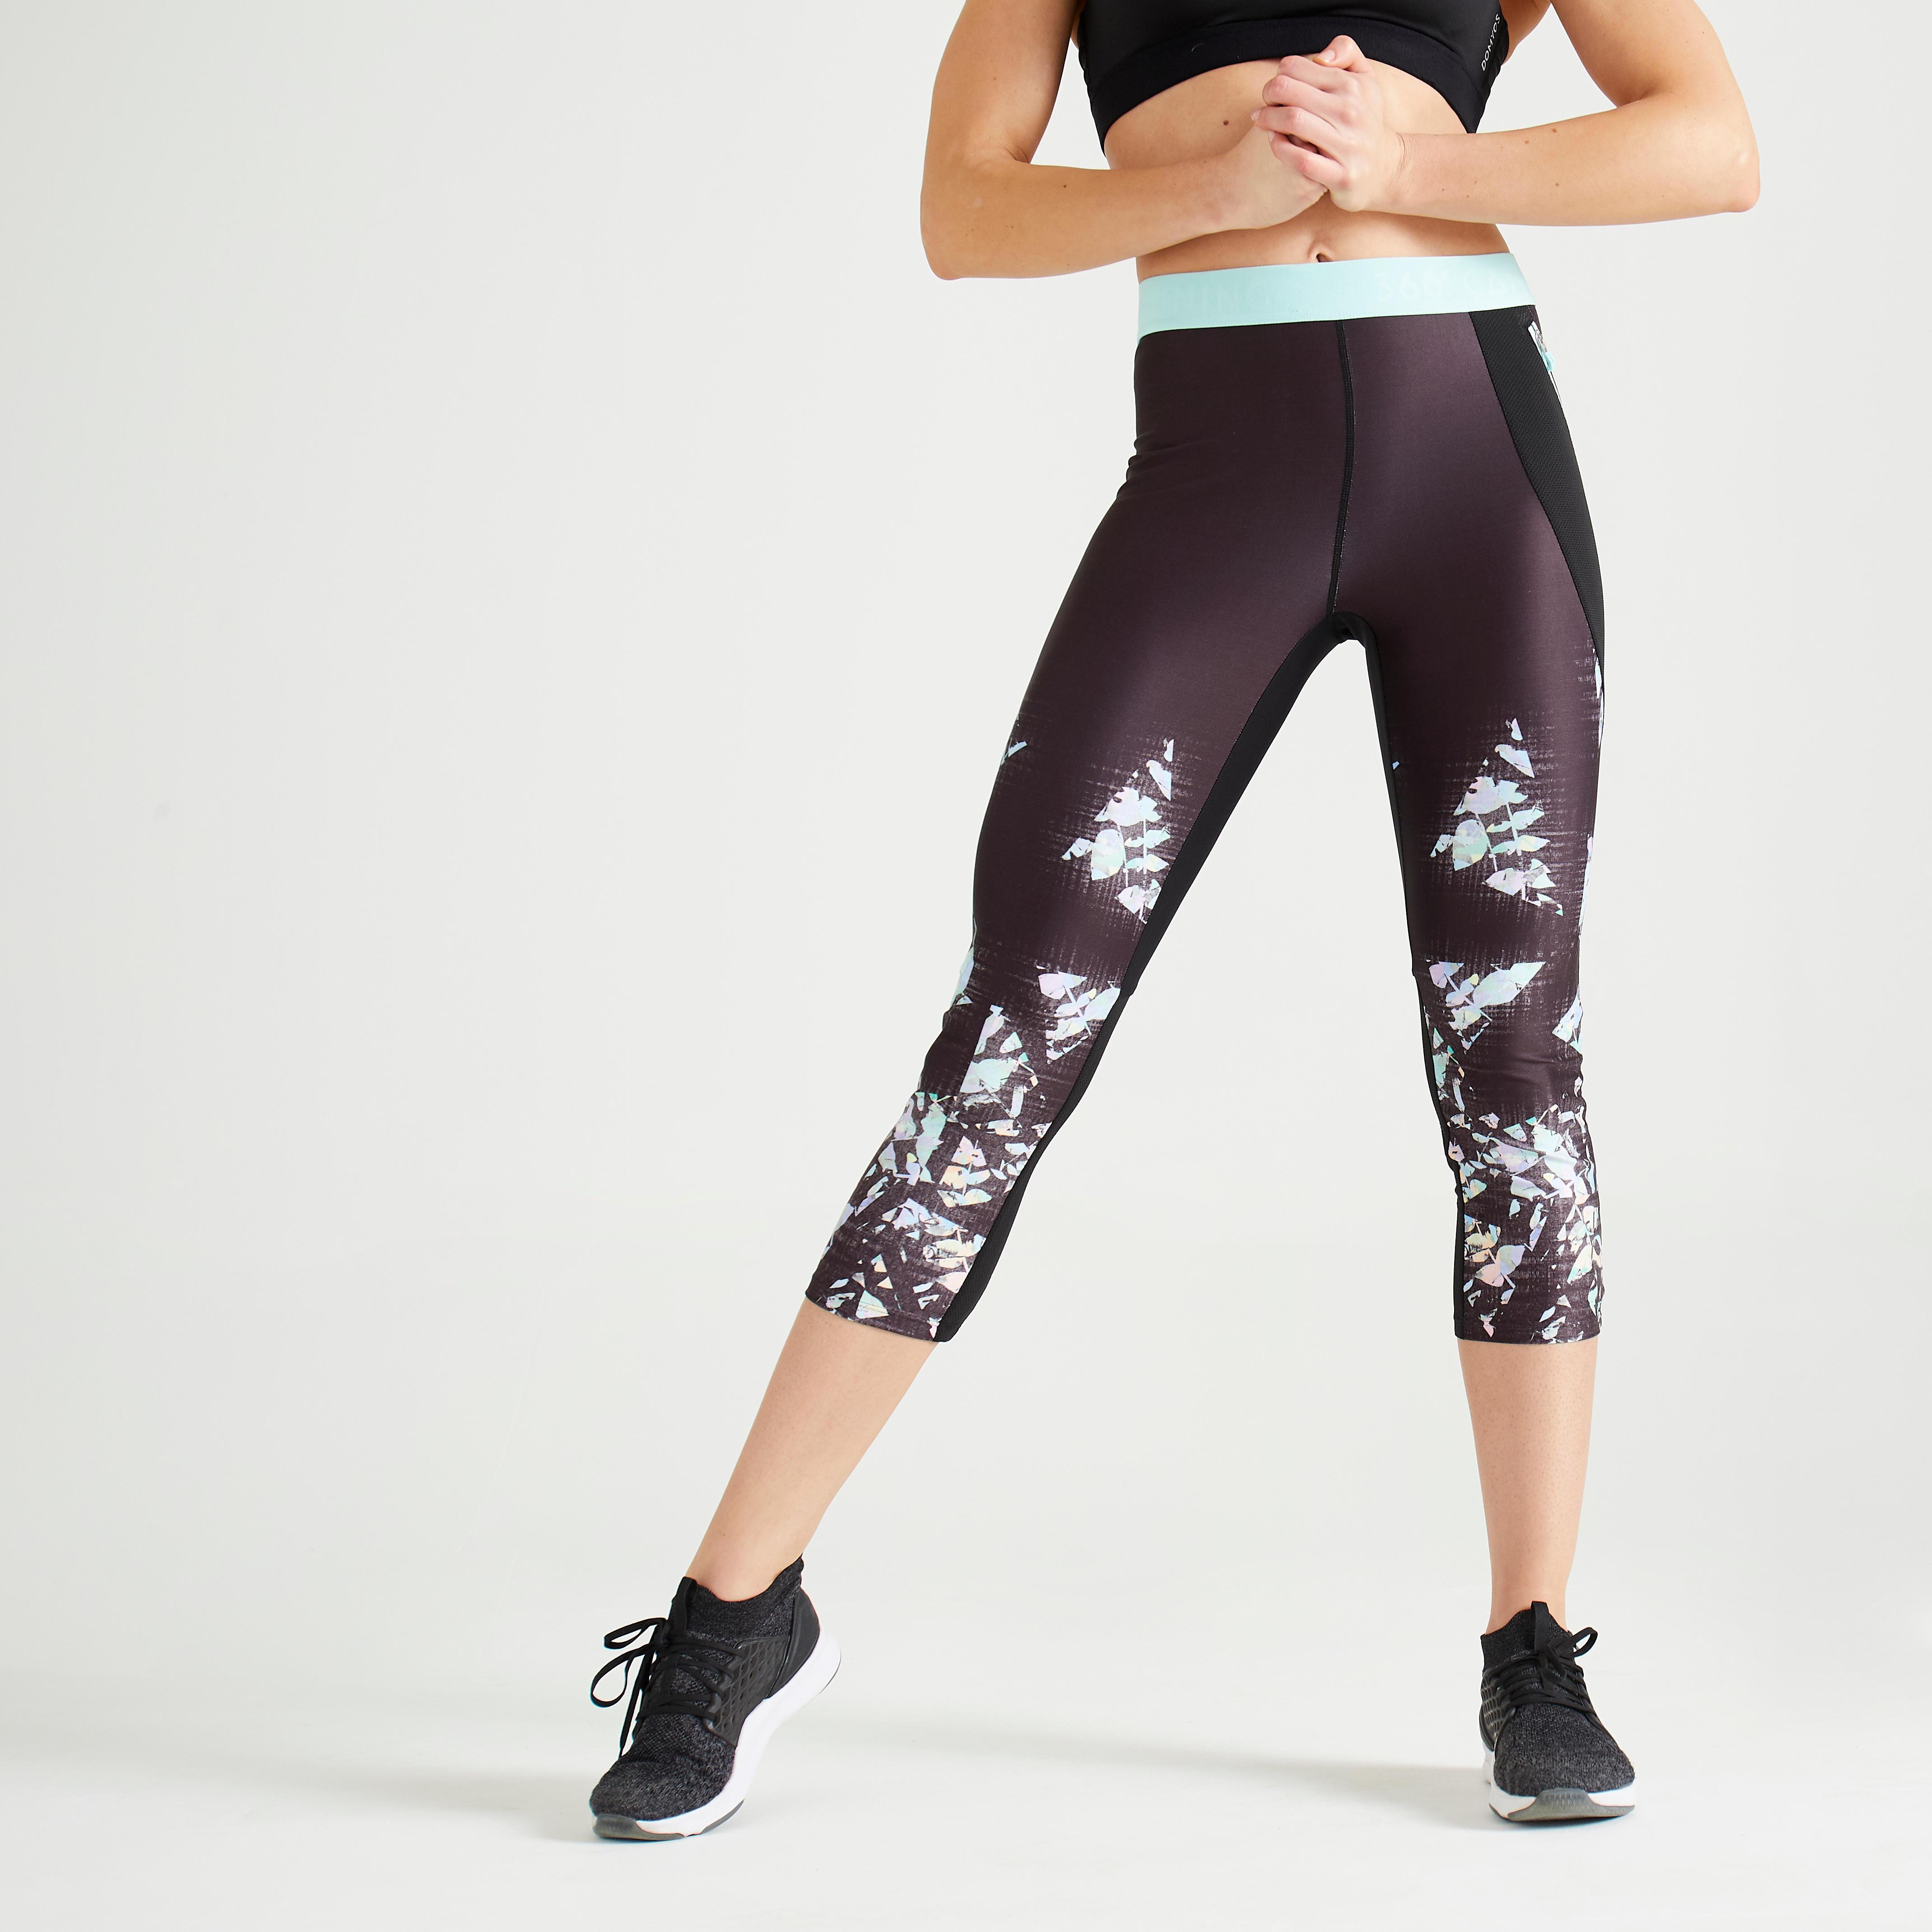 Leggings | Women Gym Cropped Bottom - Decathlon